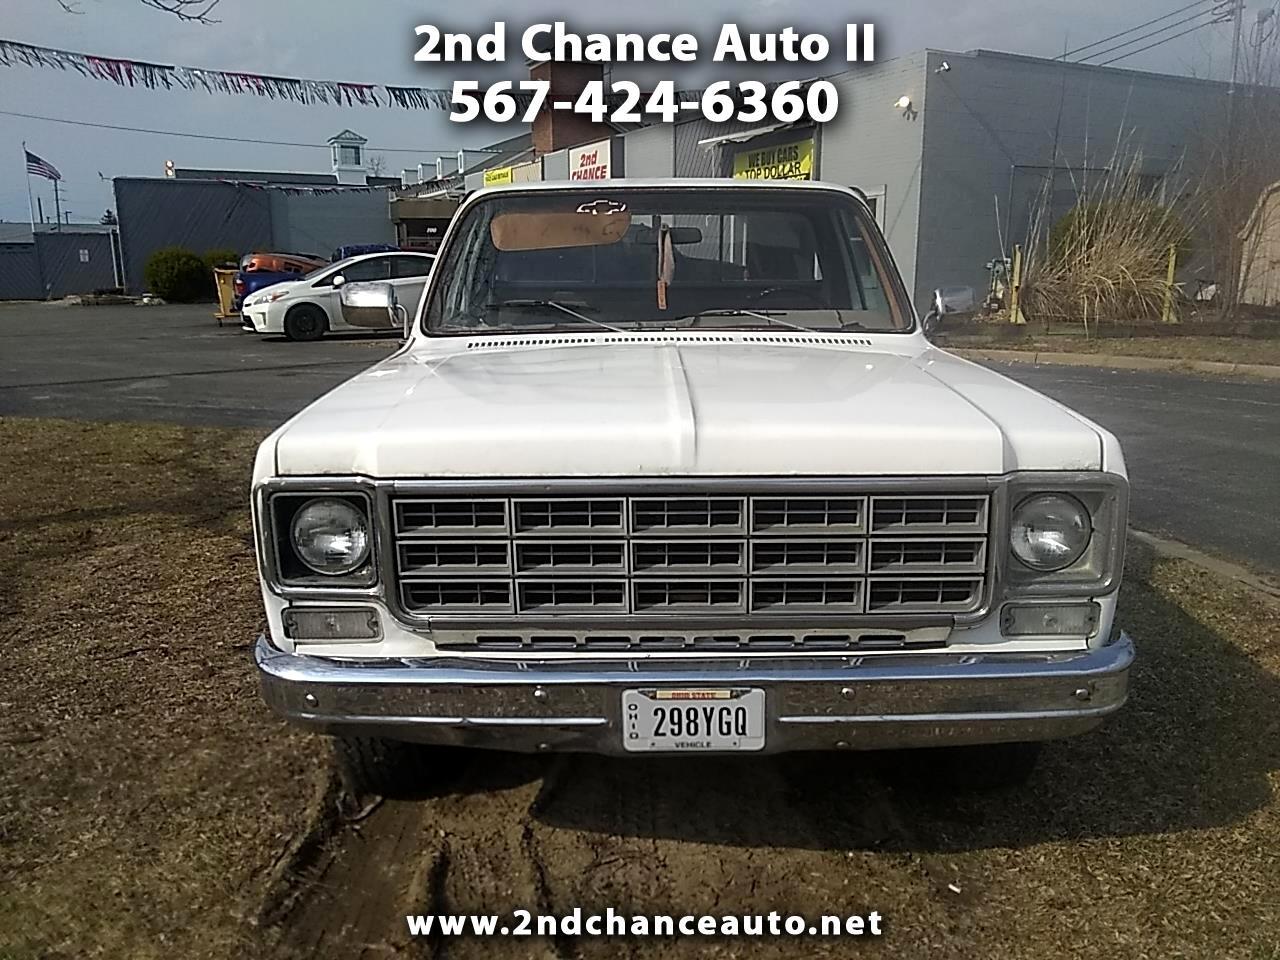 1979 Chevrolet C/K 10 Regular Cab 4WD